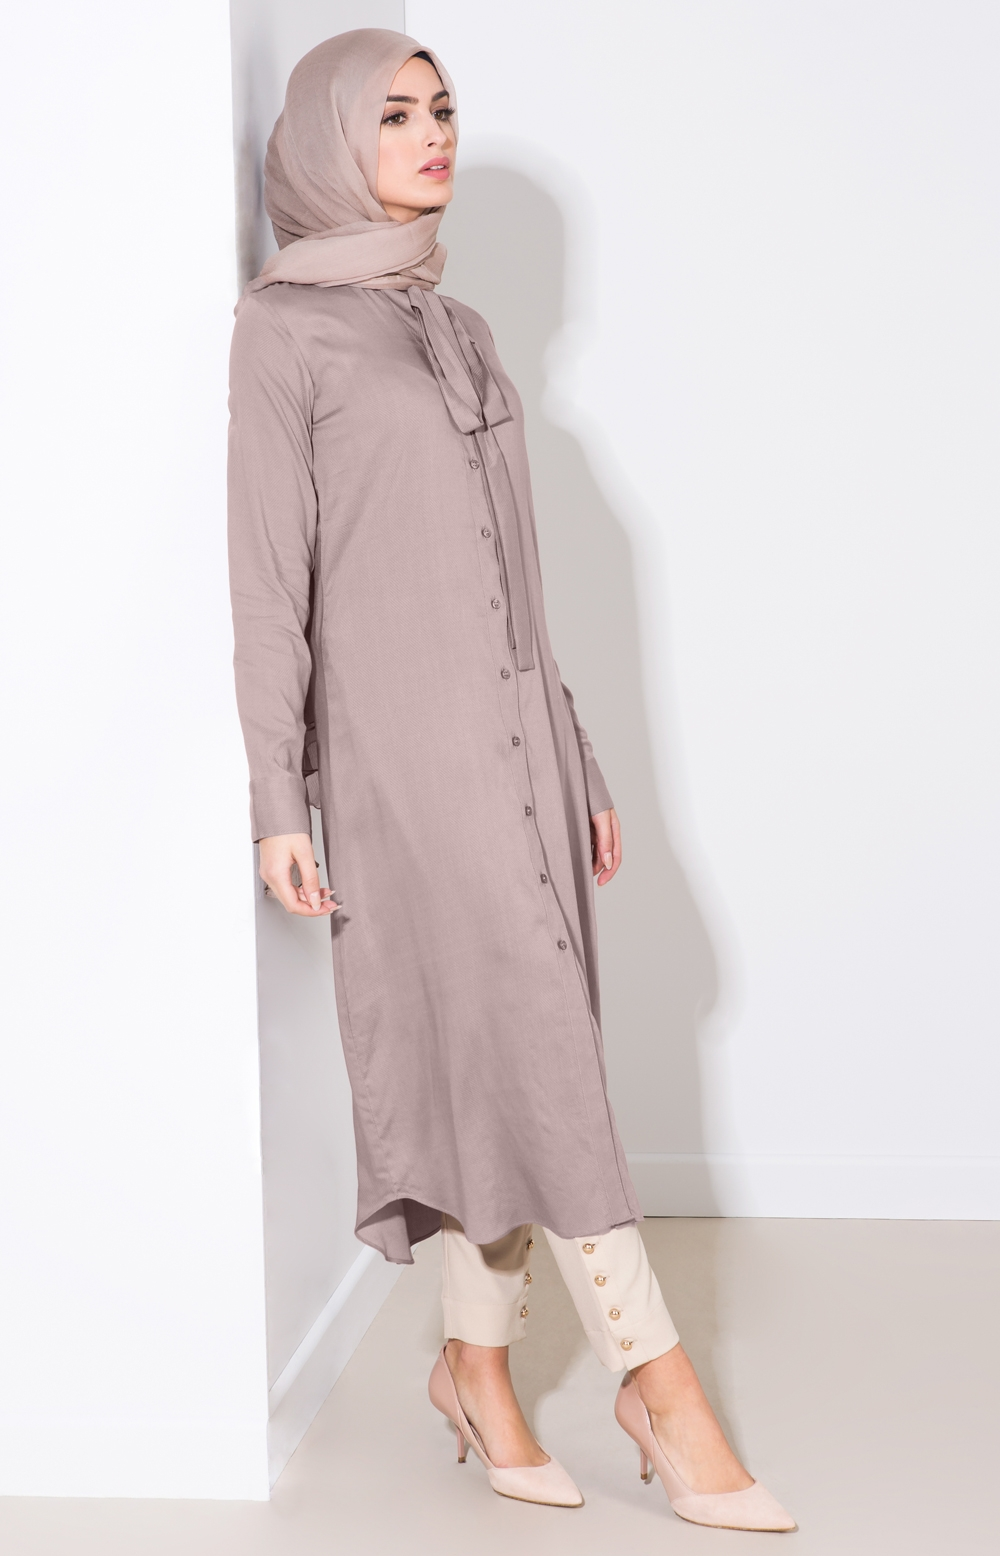 Baju Trend Lebaran 2016 Trend Baju Lebaran Hijabers